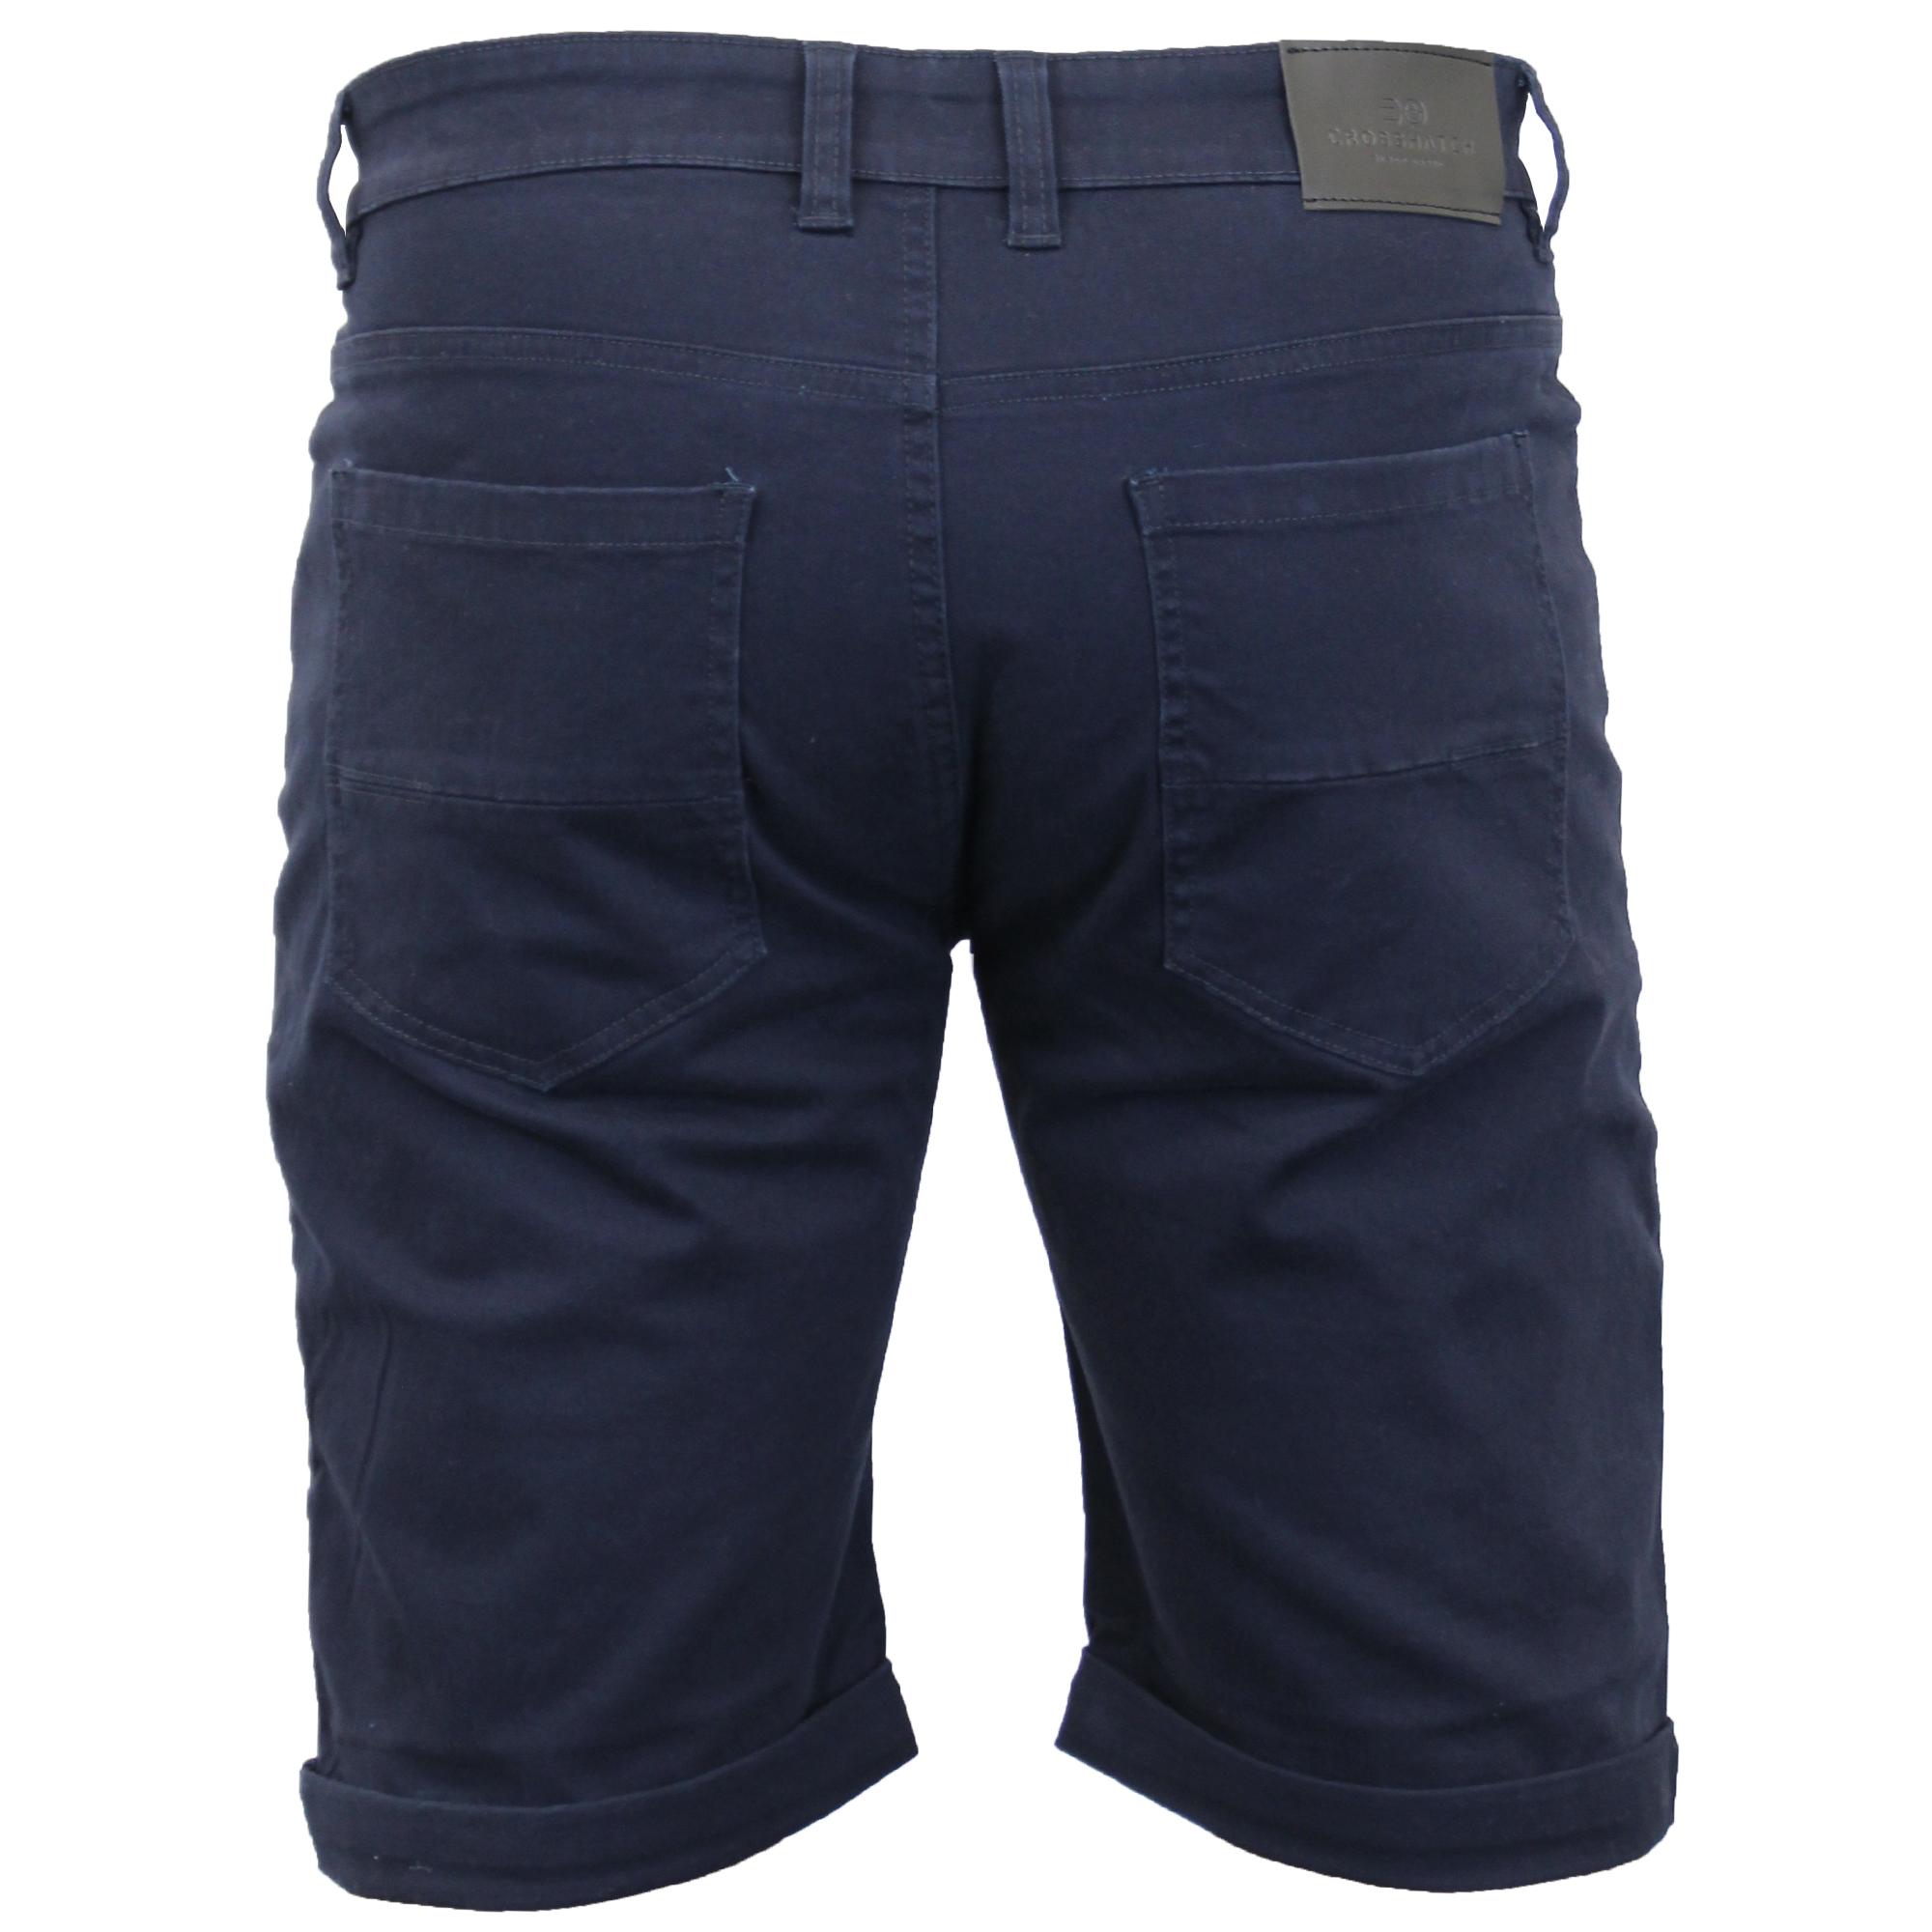 thumbnail 9 - Mens-Chino-Shorts-Crosshatch-Brandons-Knee-Length-Fastrack-Roll-Up-Summer-New